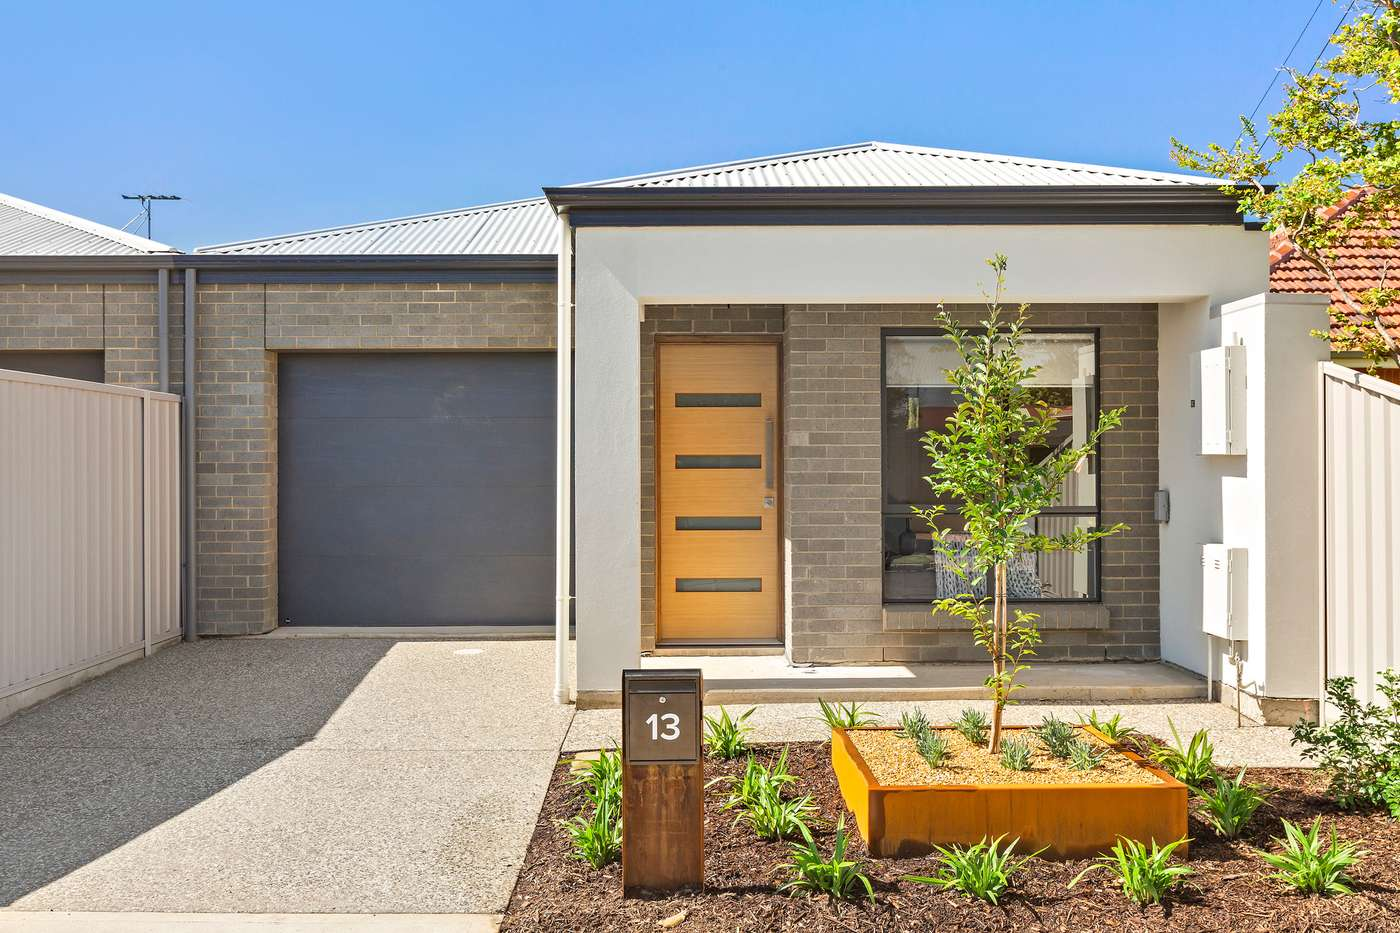 Main view of Homely house listing, 13 Michel Avenue, Plympton, SA 5038